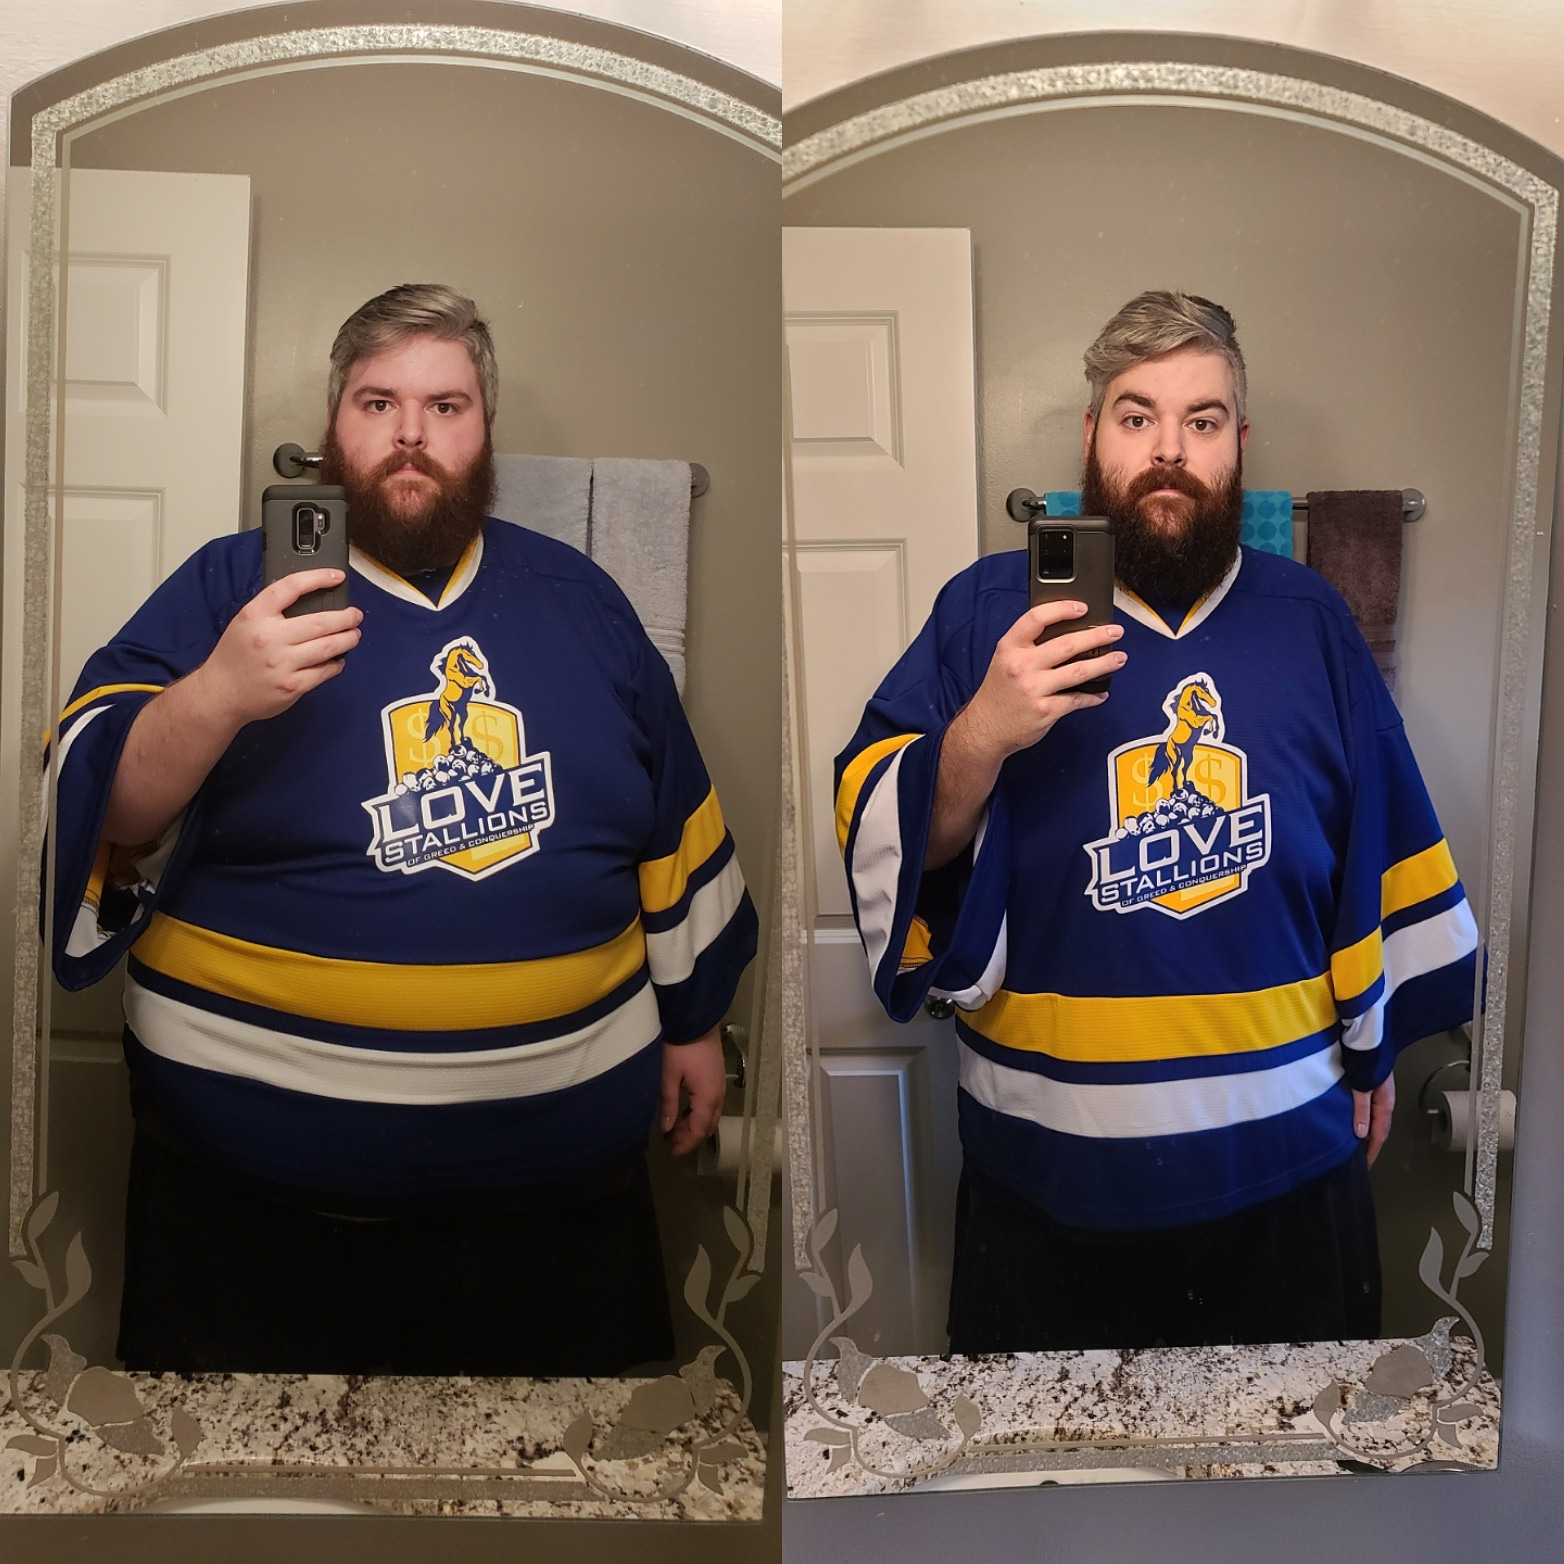 6 foot 2 Male 137 lbs Weight Loss 469 lbs to 332 lbs